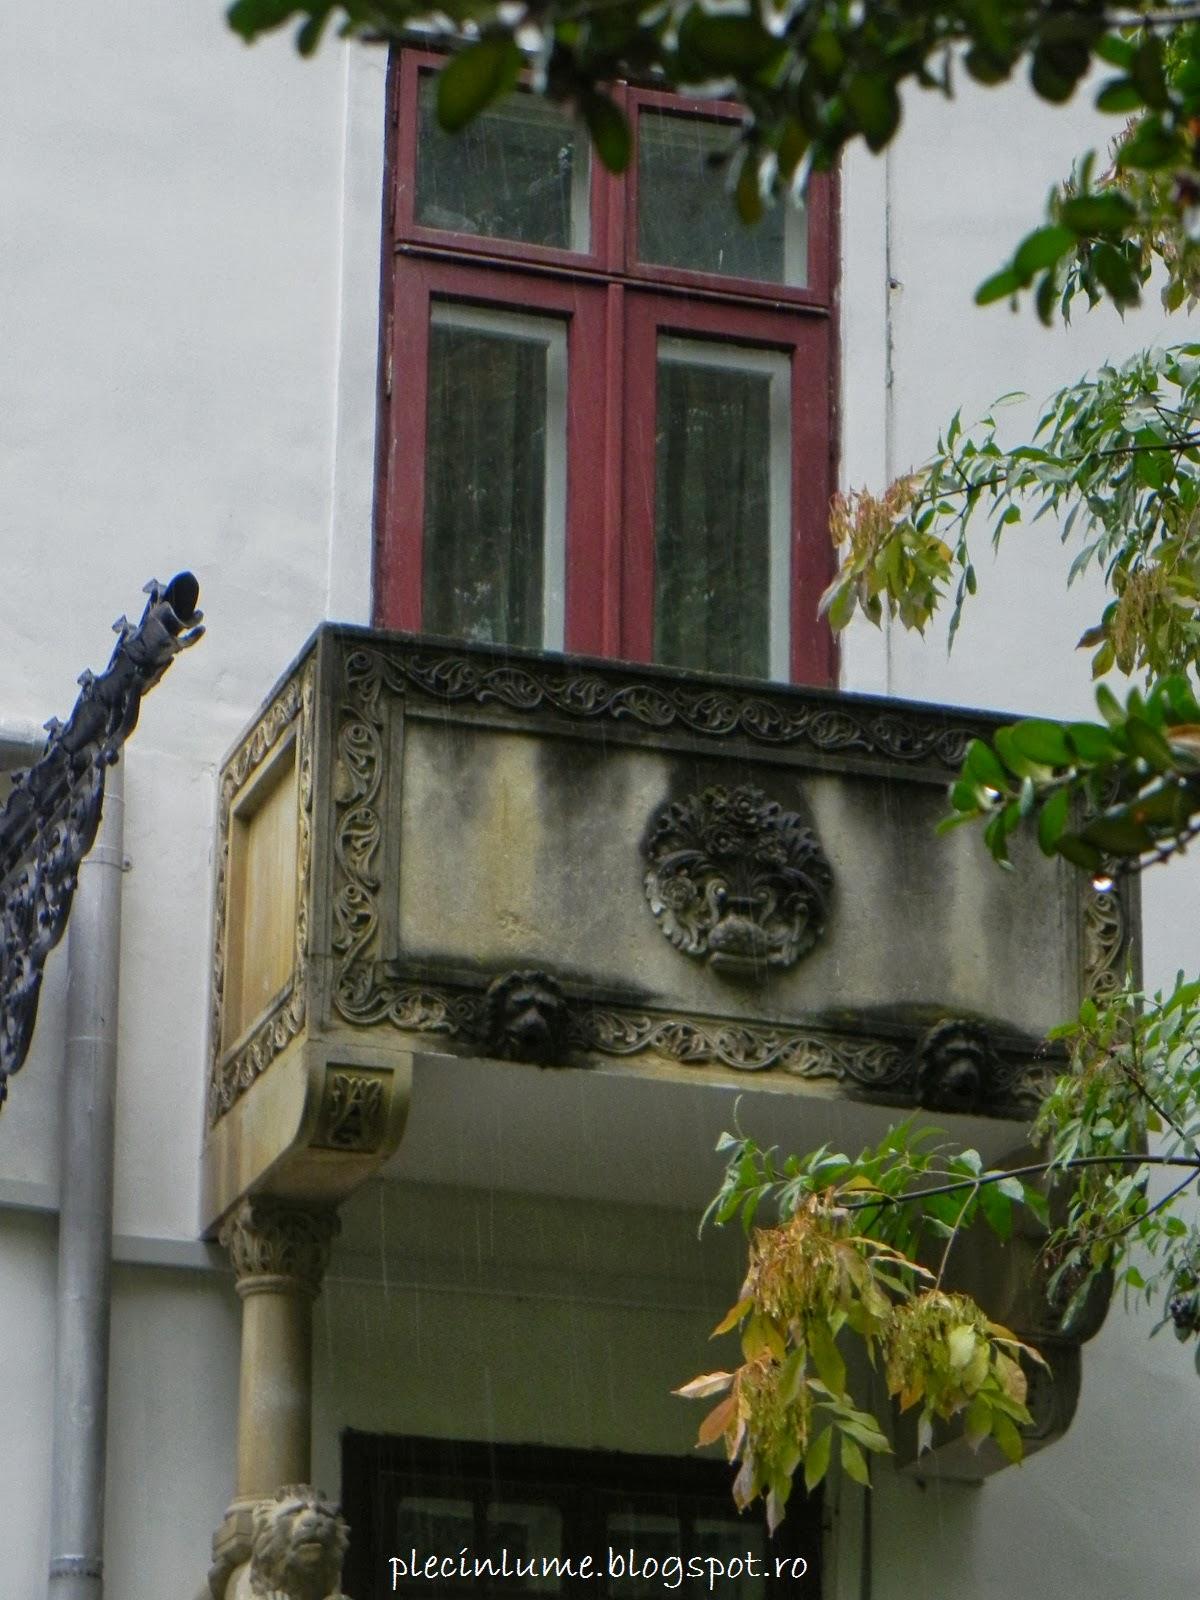 Balcon al vilei Florica